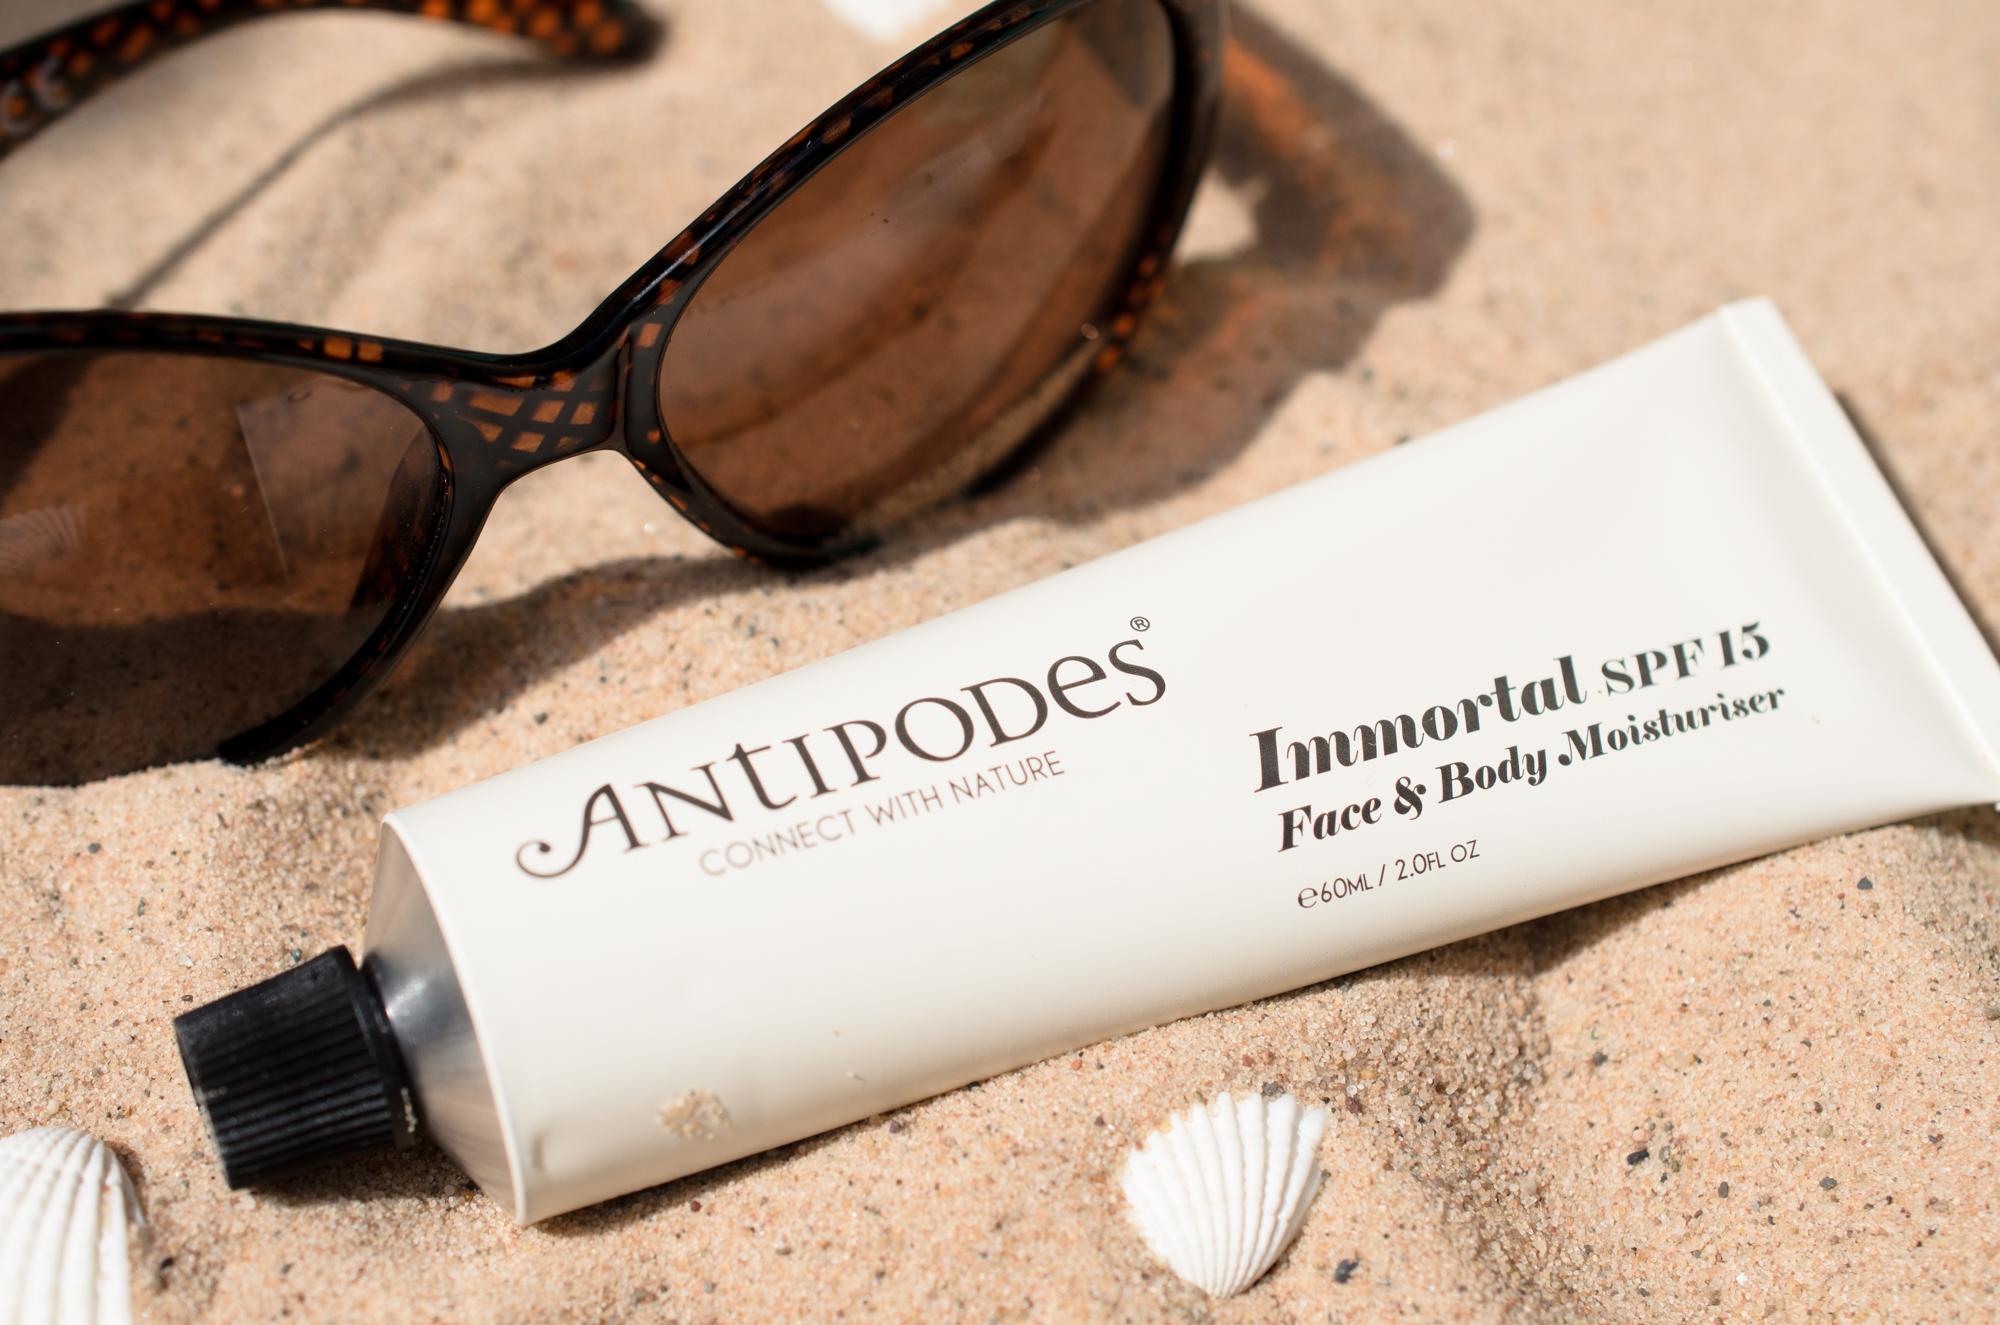 Antipodes Immortal Face & Body Moisturiser SPF 15